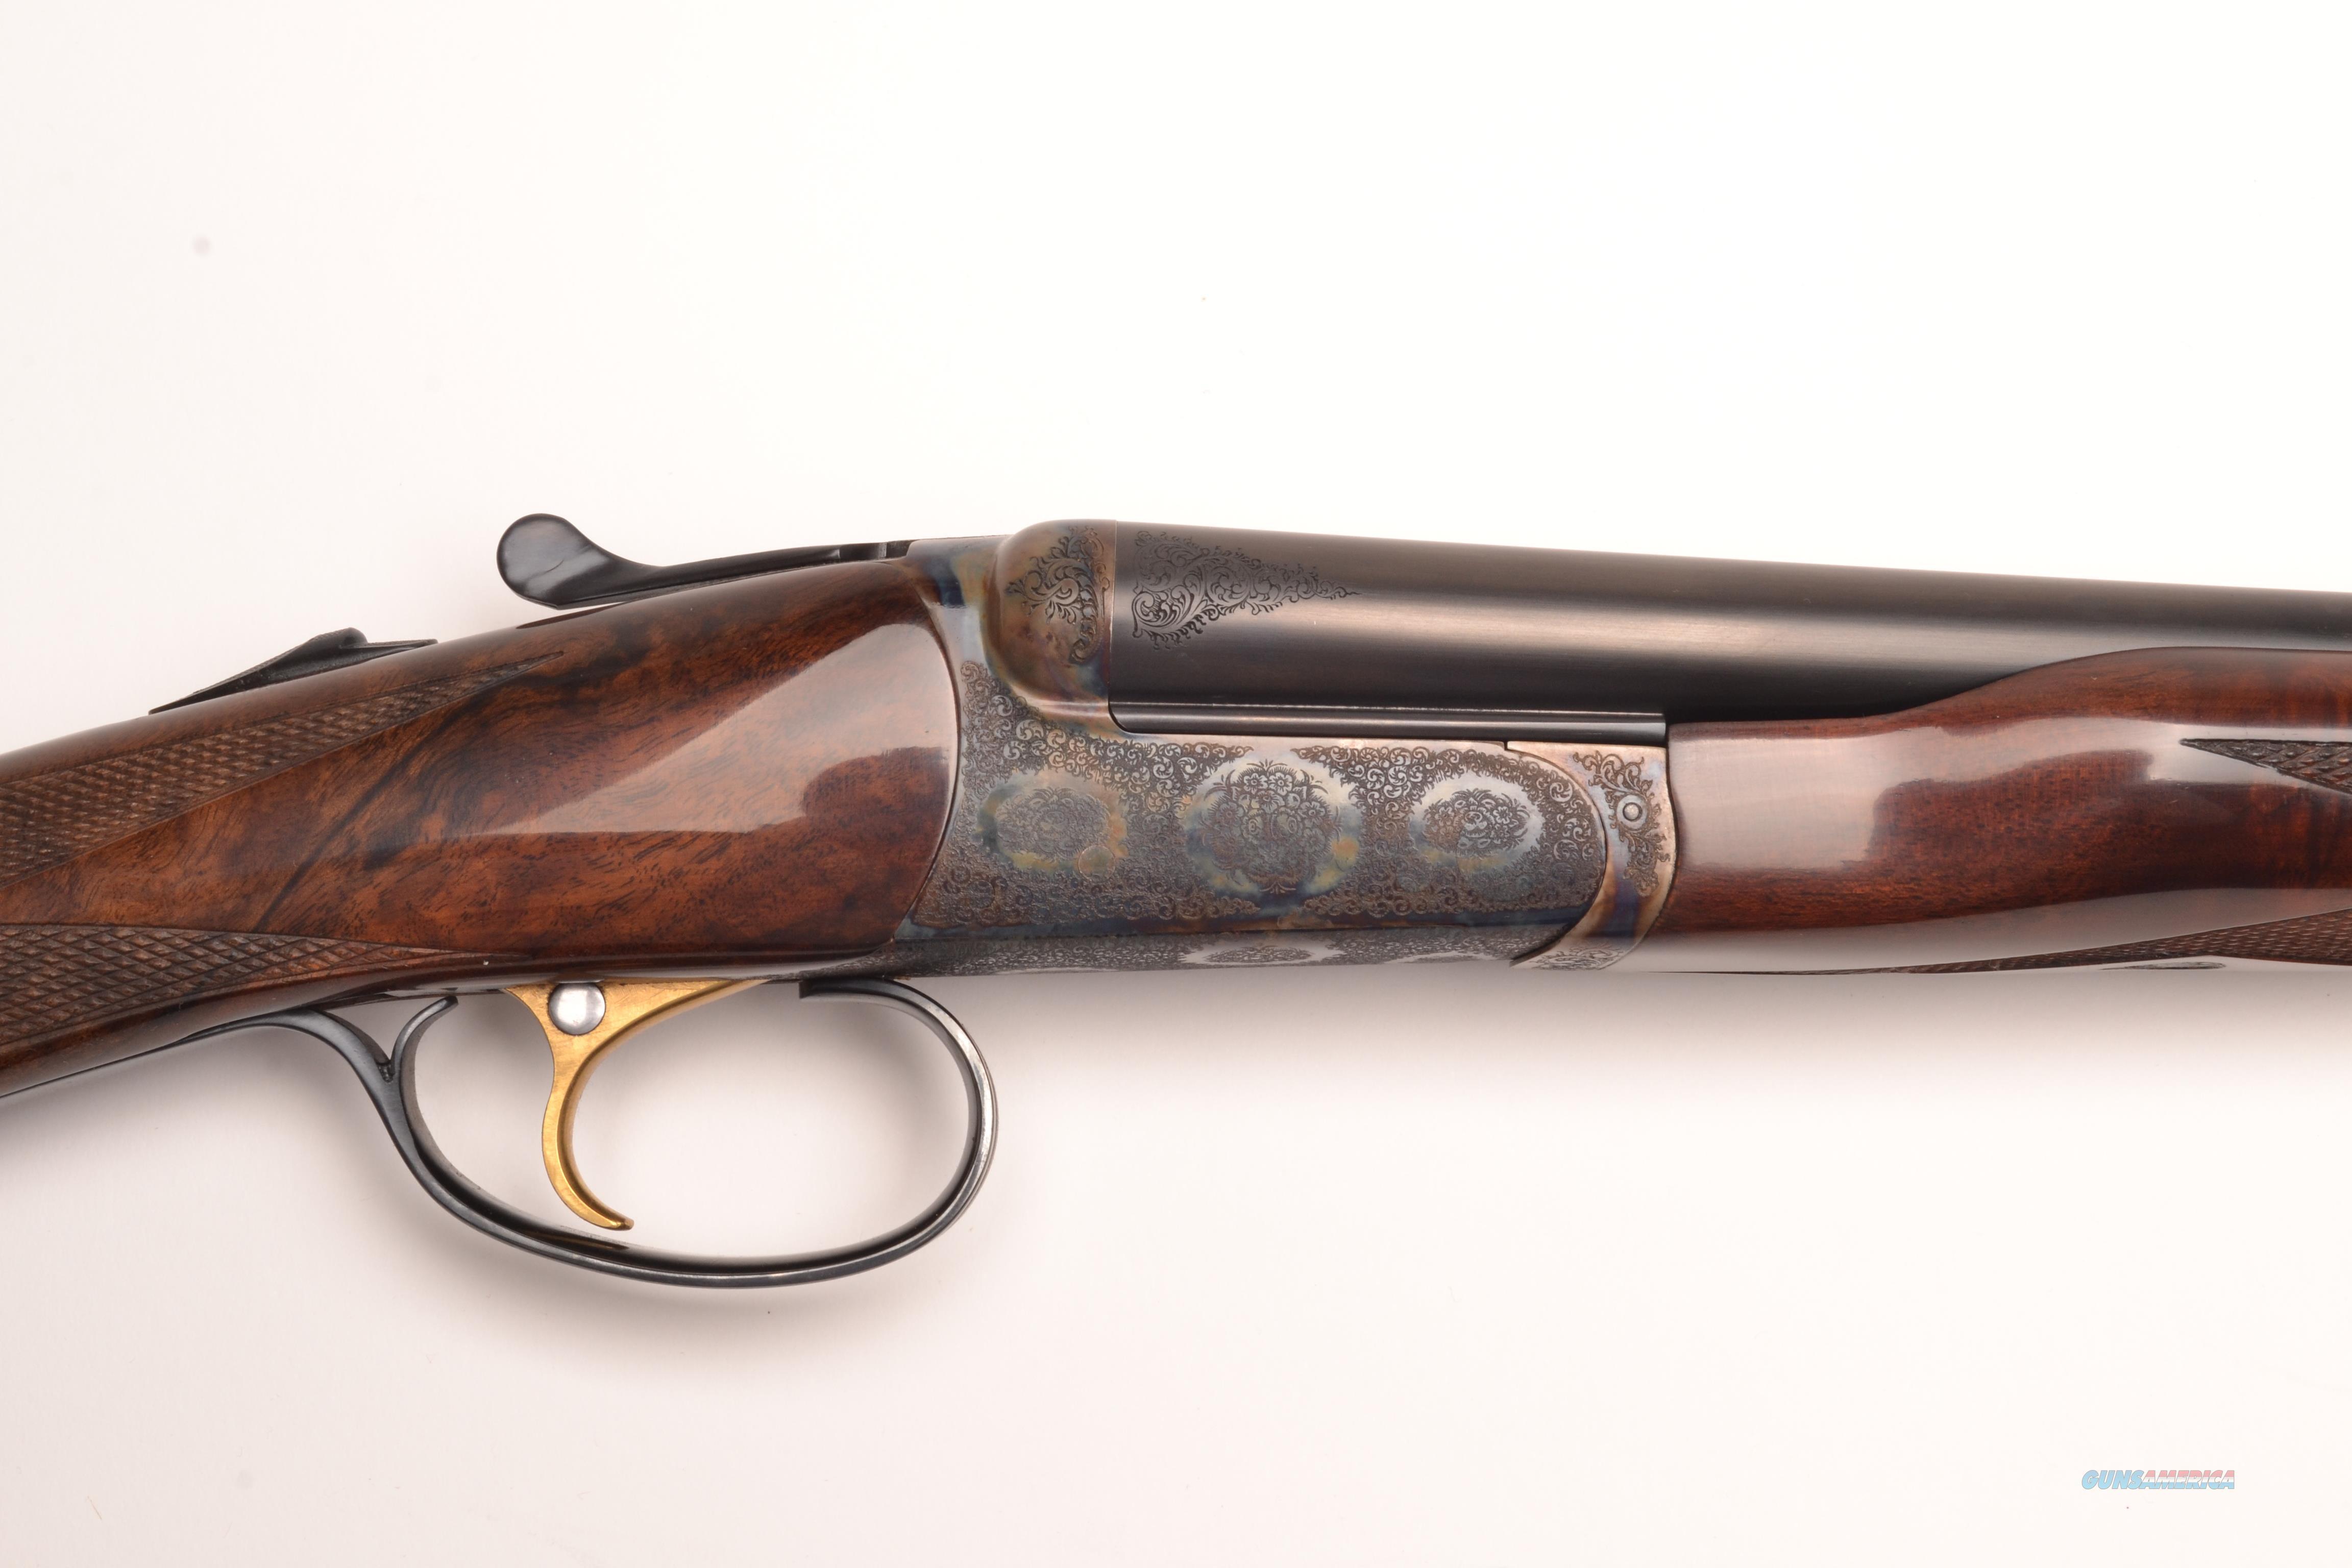 CSMC - RBL 28 Reserve, Rose & Scroll Engraved, 28ga  Guns > Shotguns > Connecticut (Galazan) Shotguns